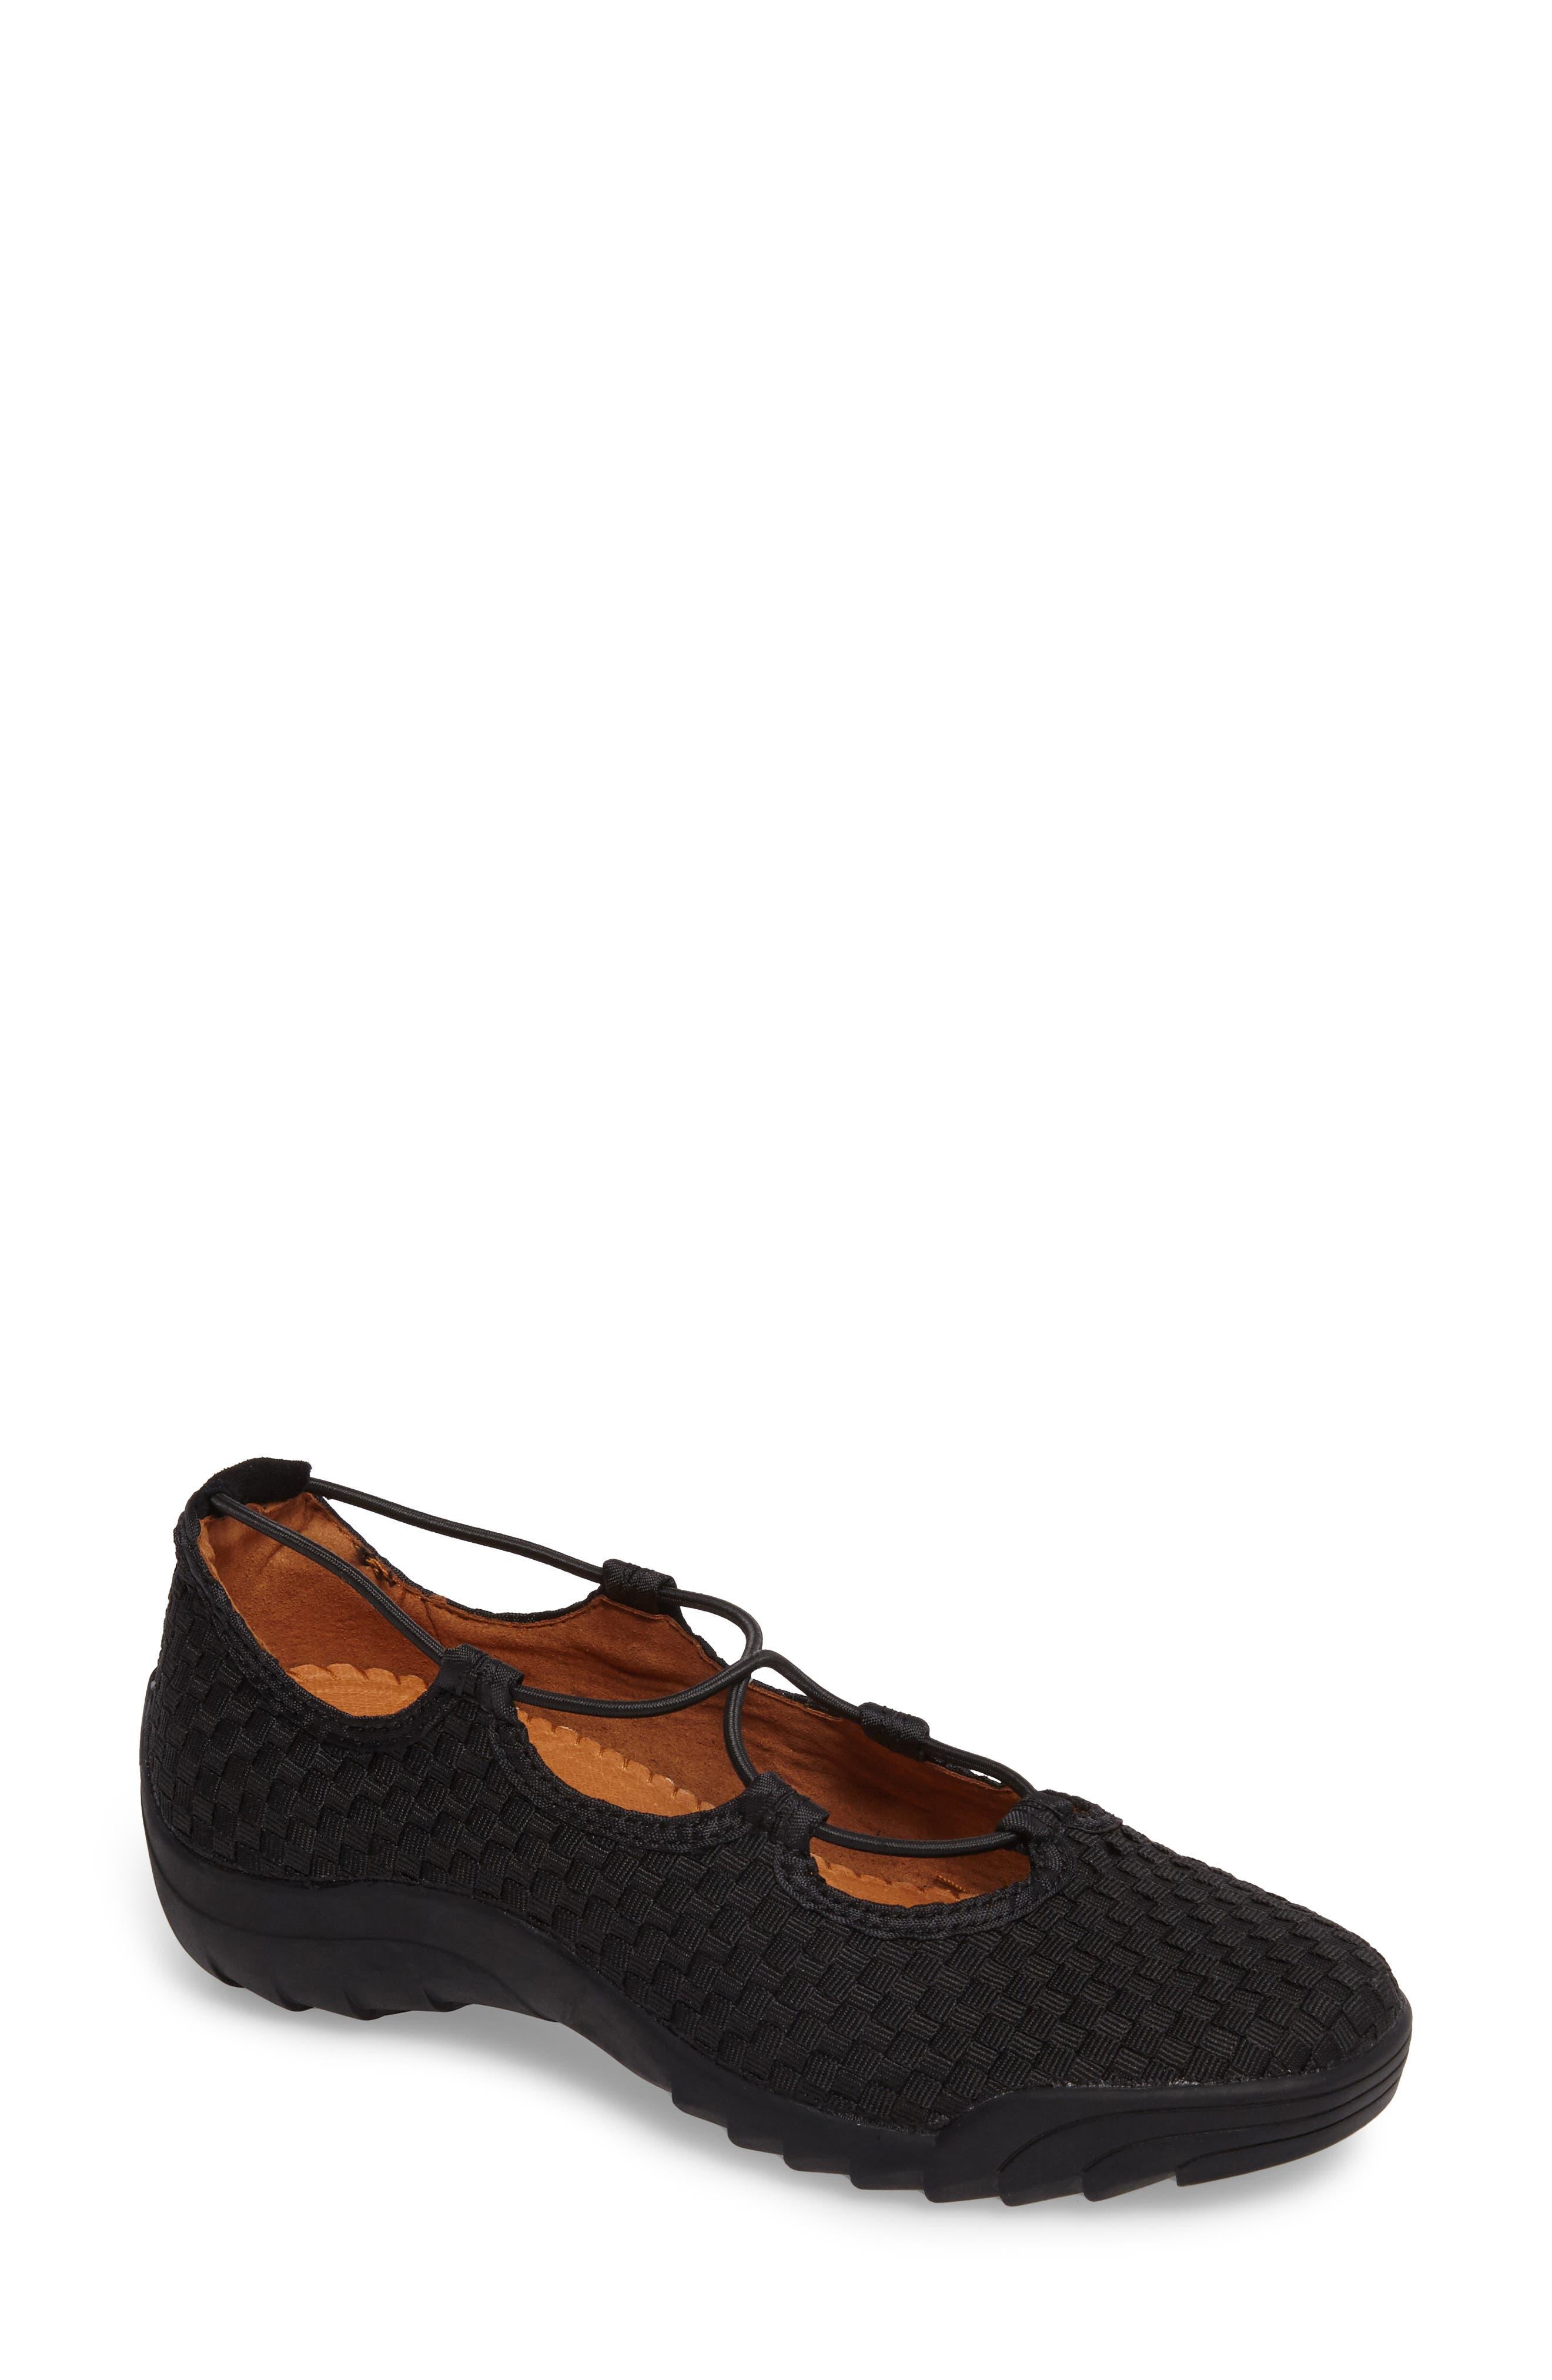 Bernie Mev Rigged Connect Sneaker, Black